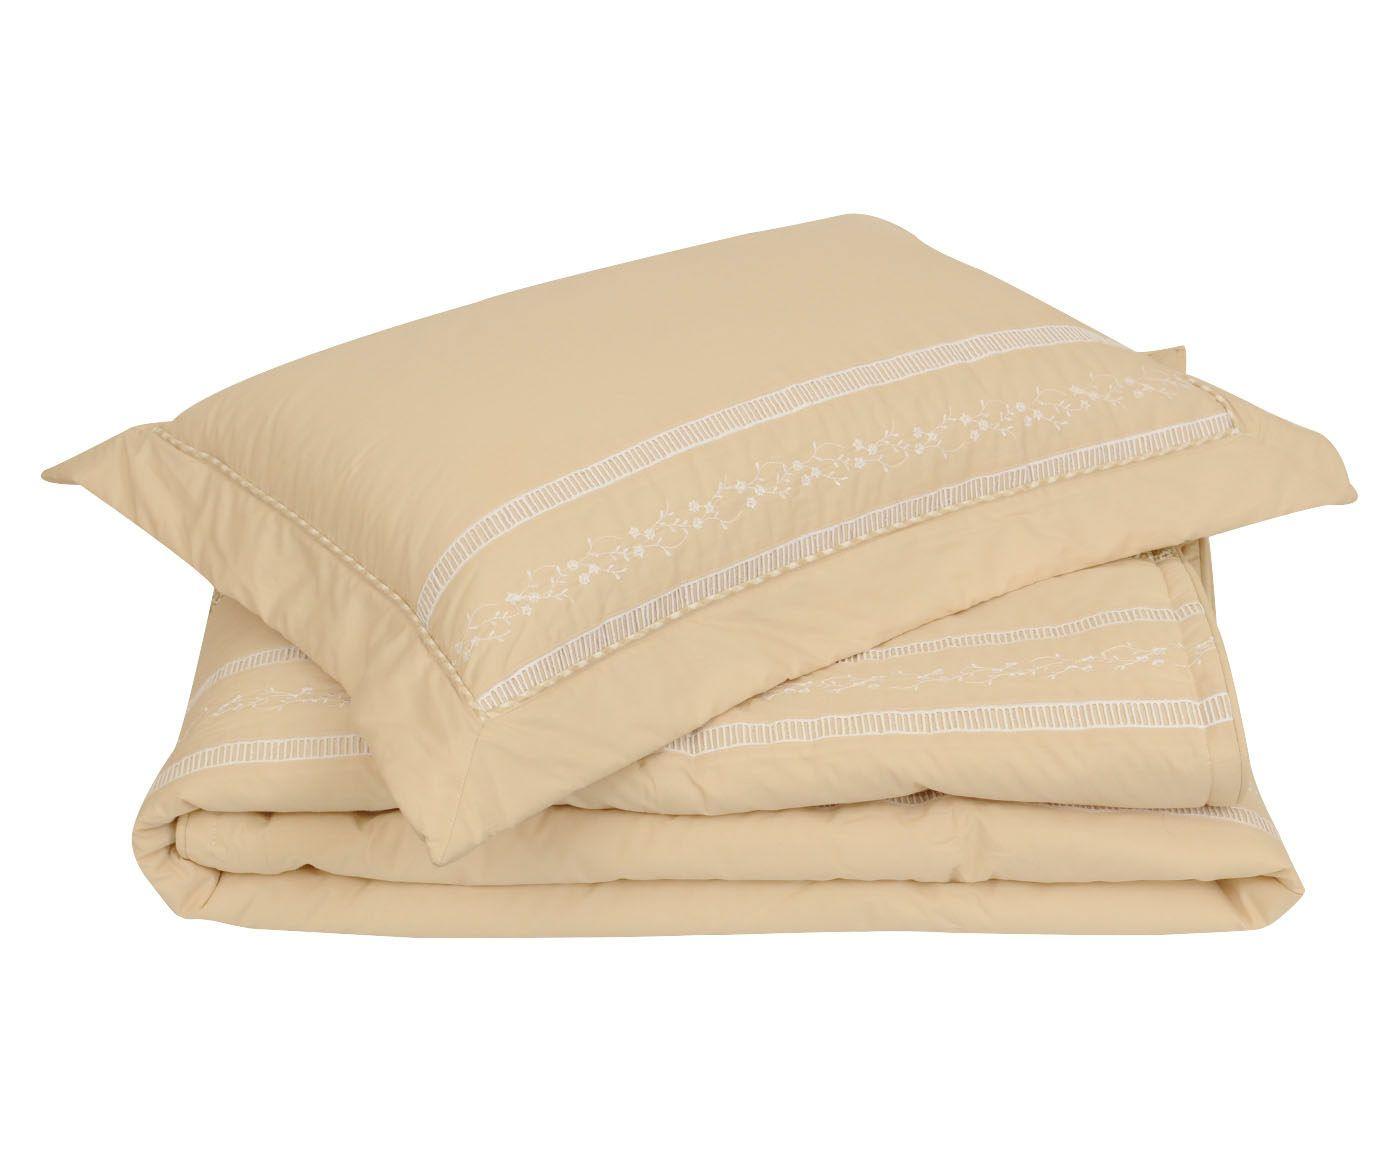 Conjunto de colcha daya para cama king size 200 fios | Westwing.com.br